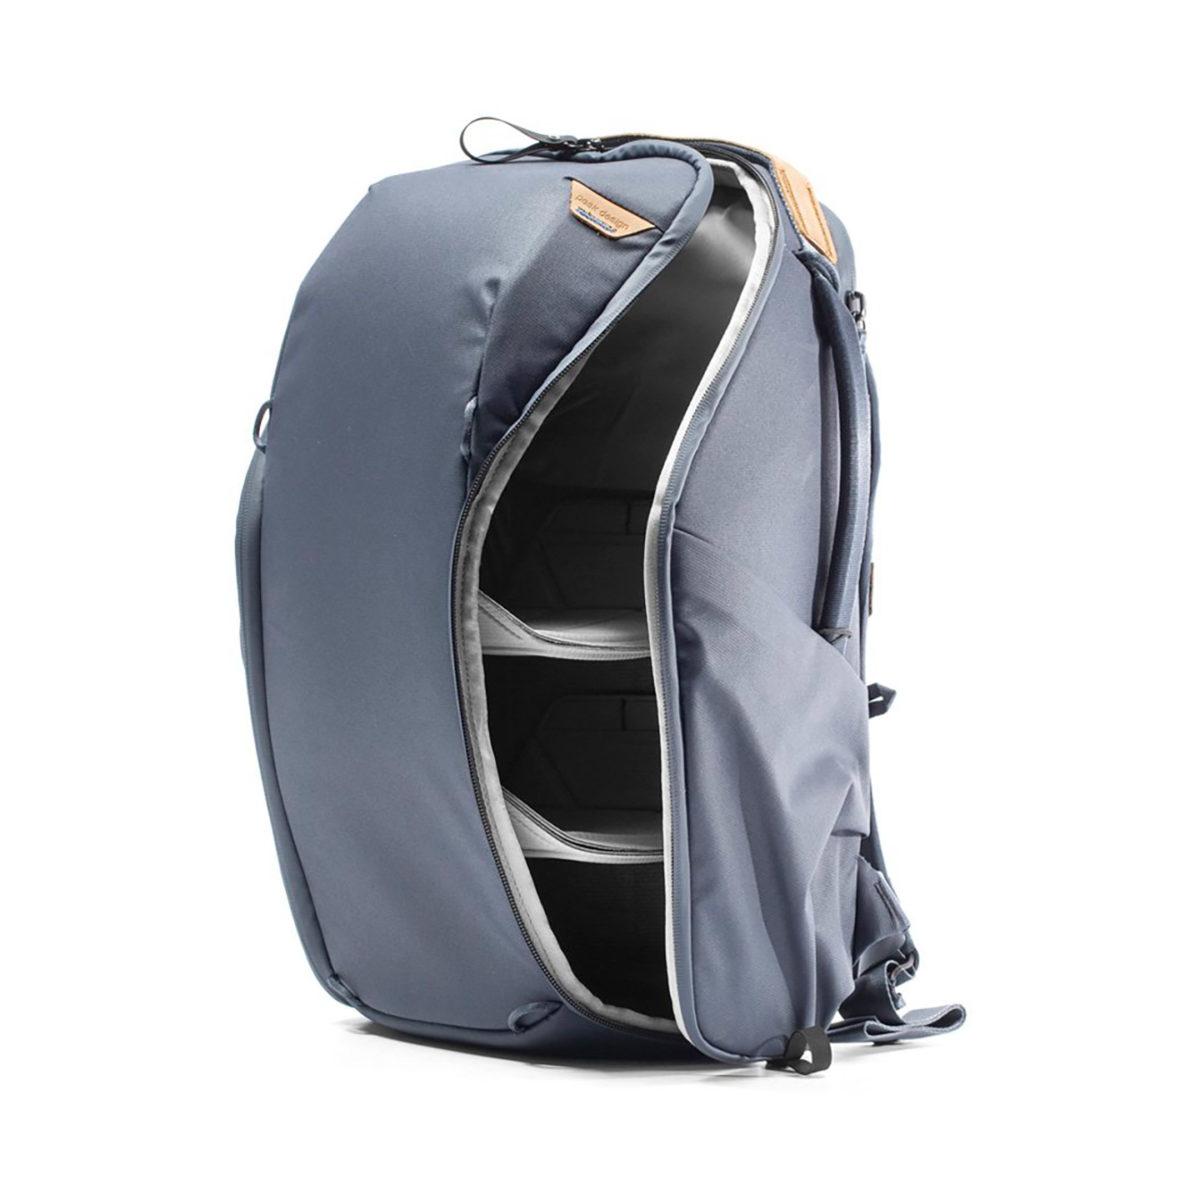 peak_design_everyday_backpack_zip_v2_04